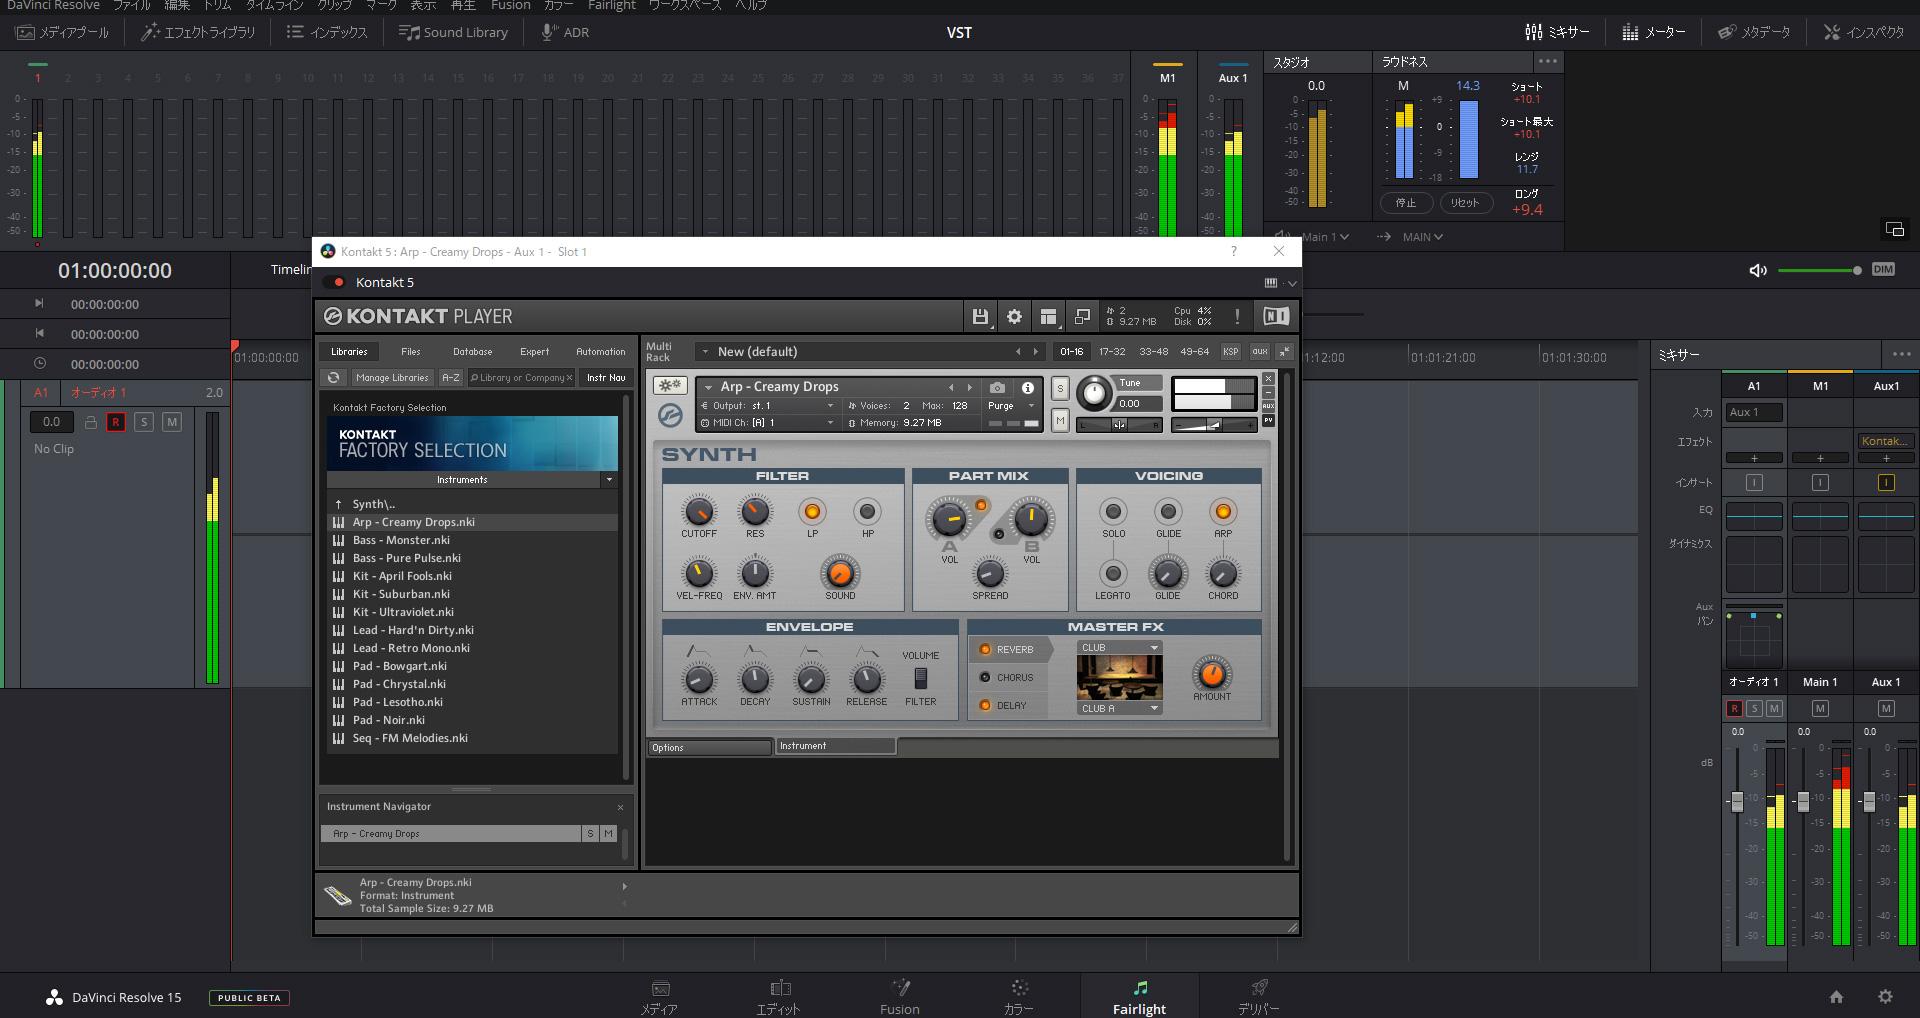 DaVinci Resolve 15 – VSTiを使う MIDI機器の設定